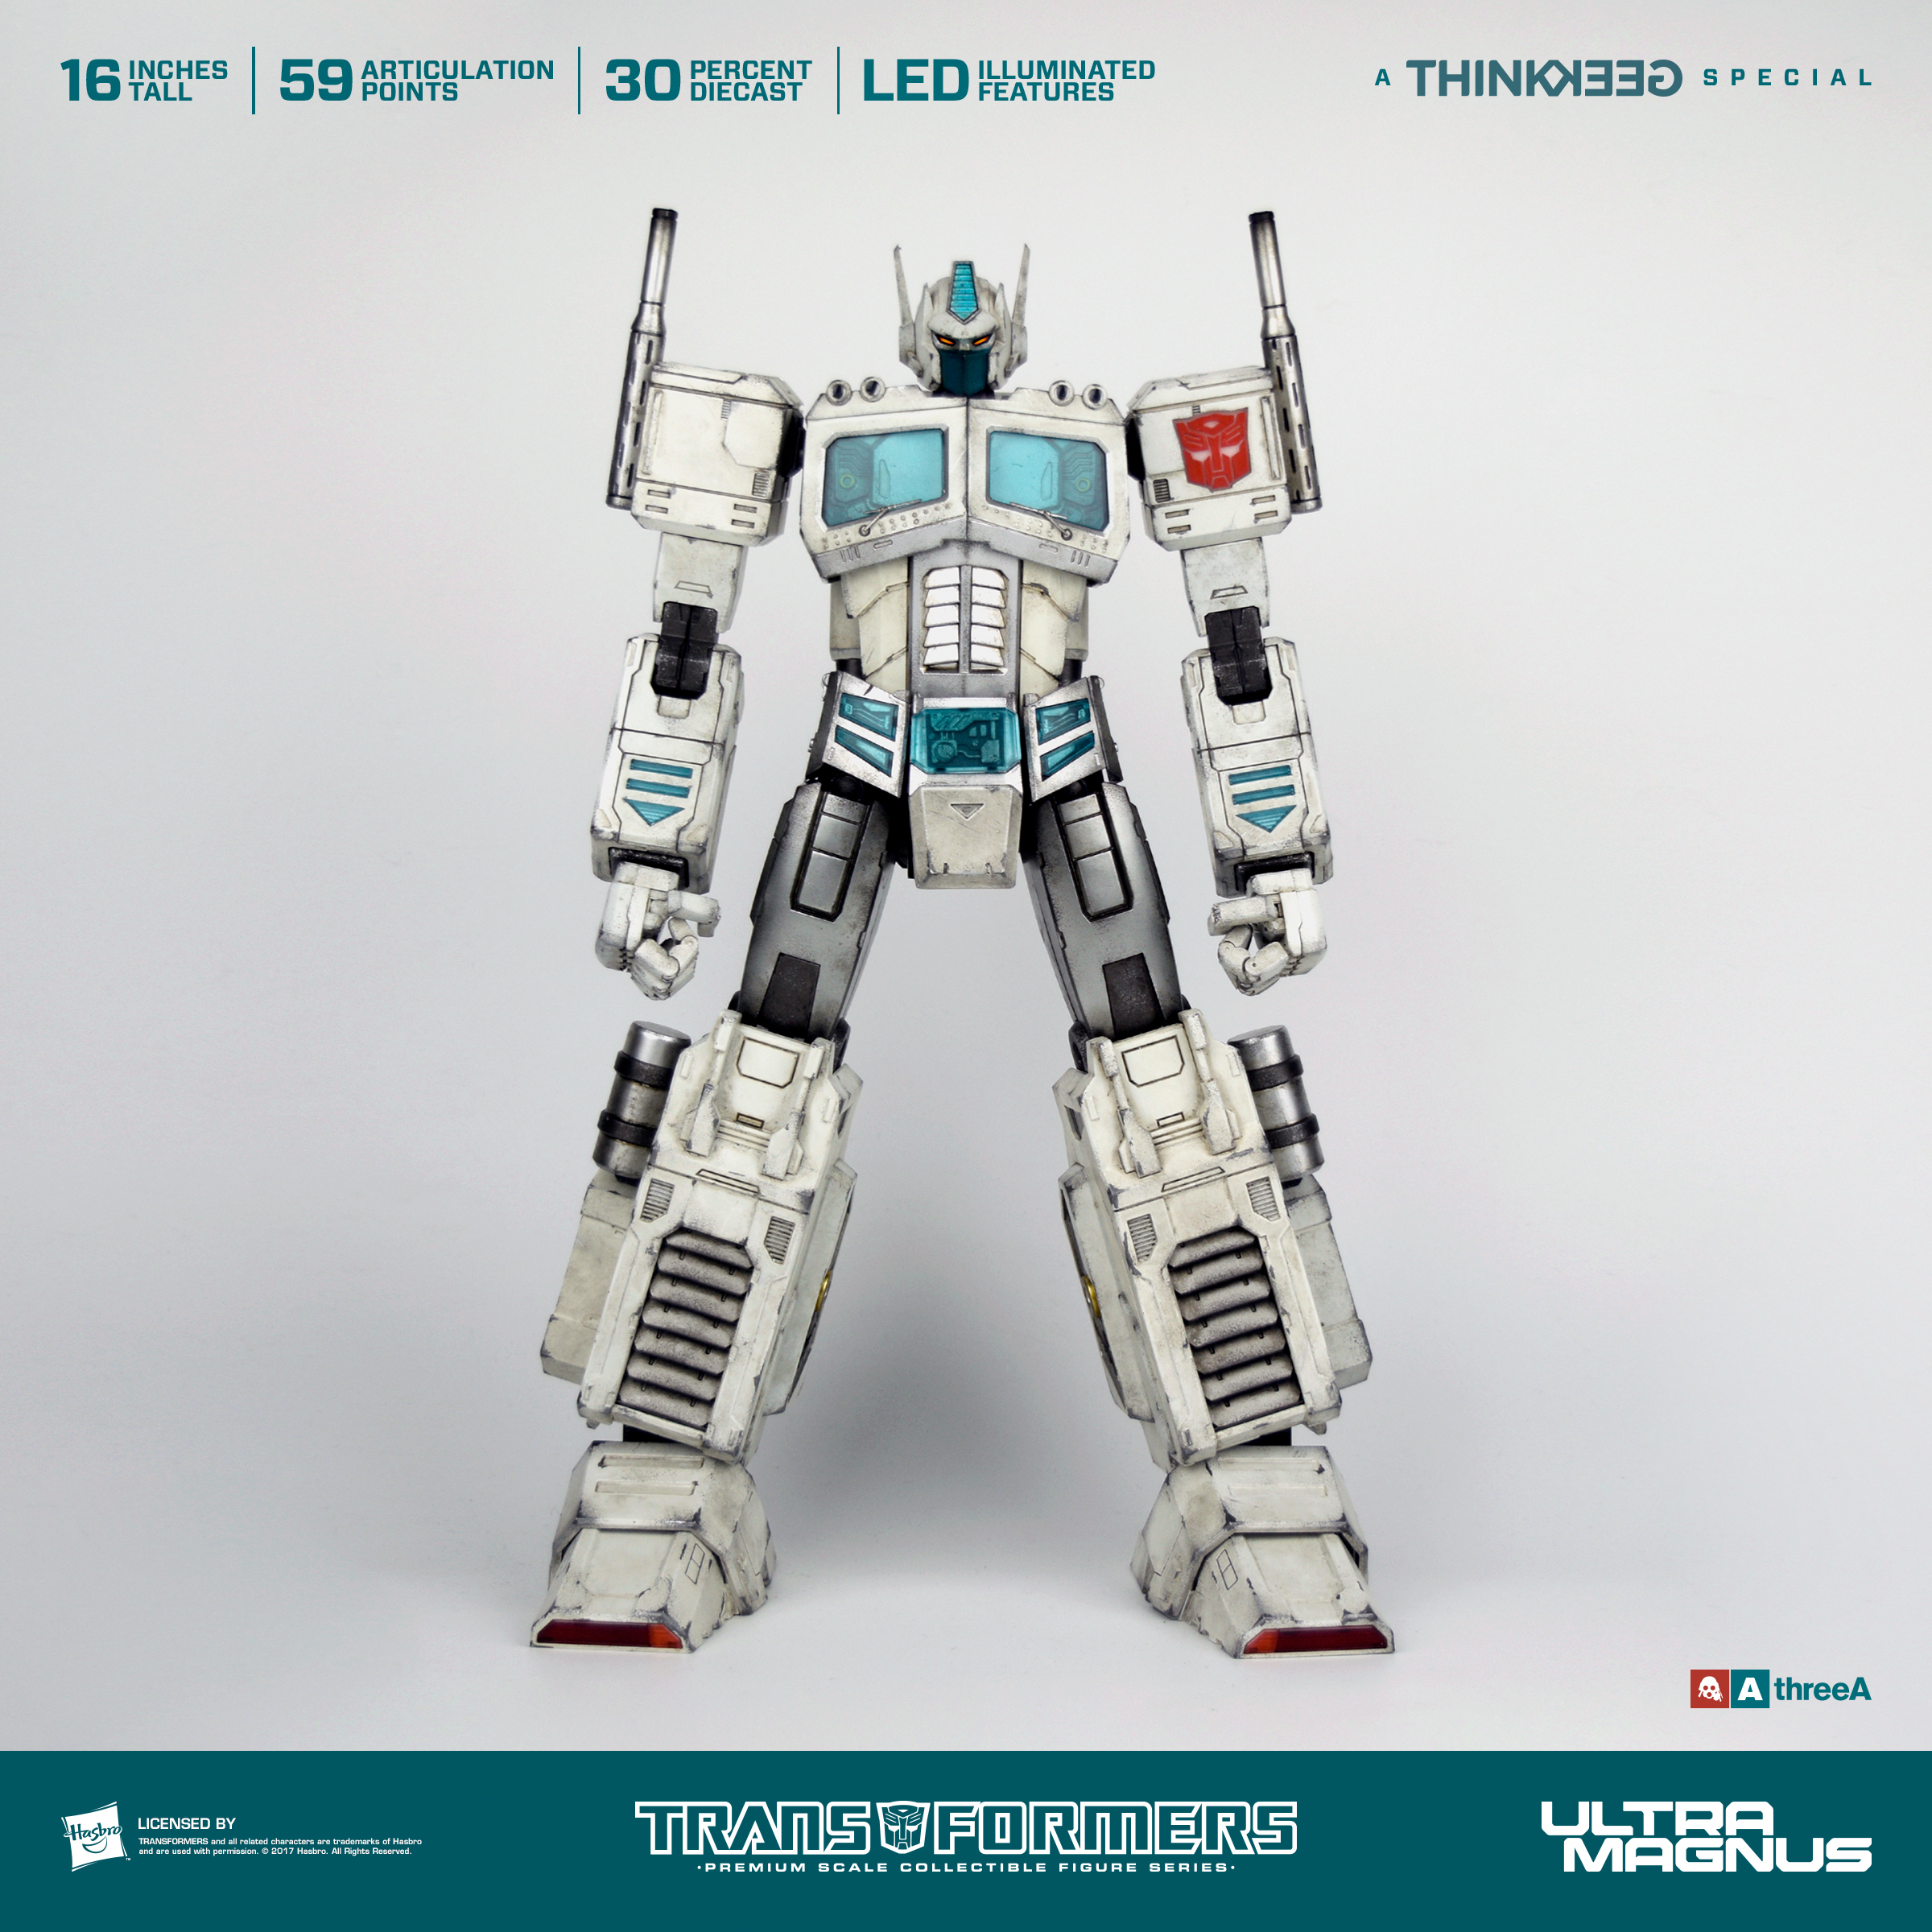 3A_Transformers_G1_UltraMagnus_RetailImages_2400x2400_001.jpg